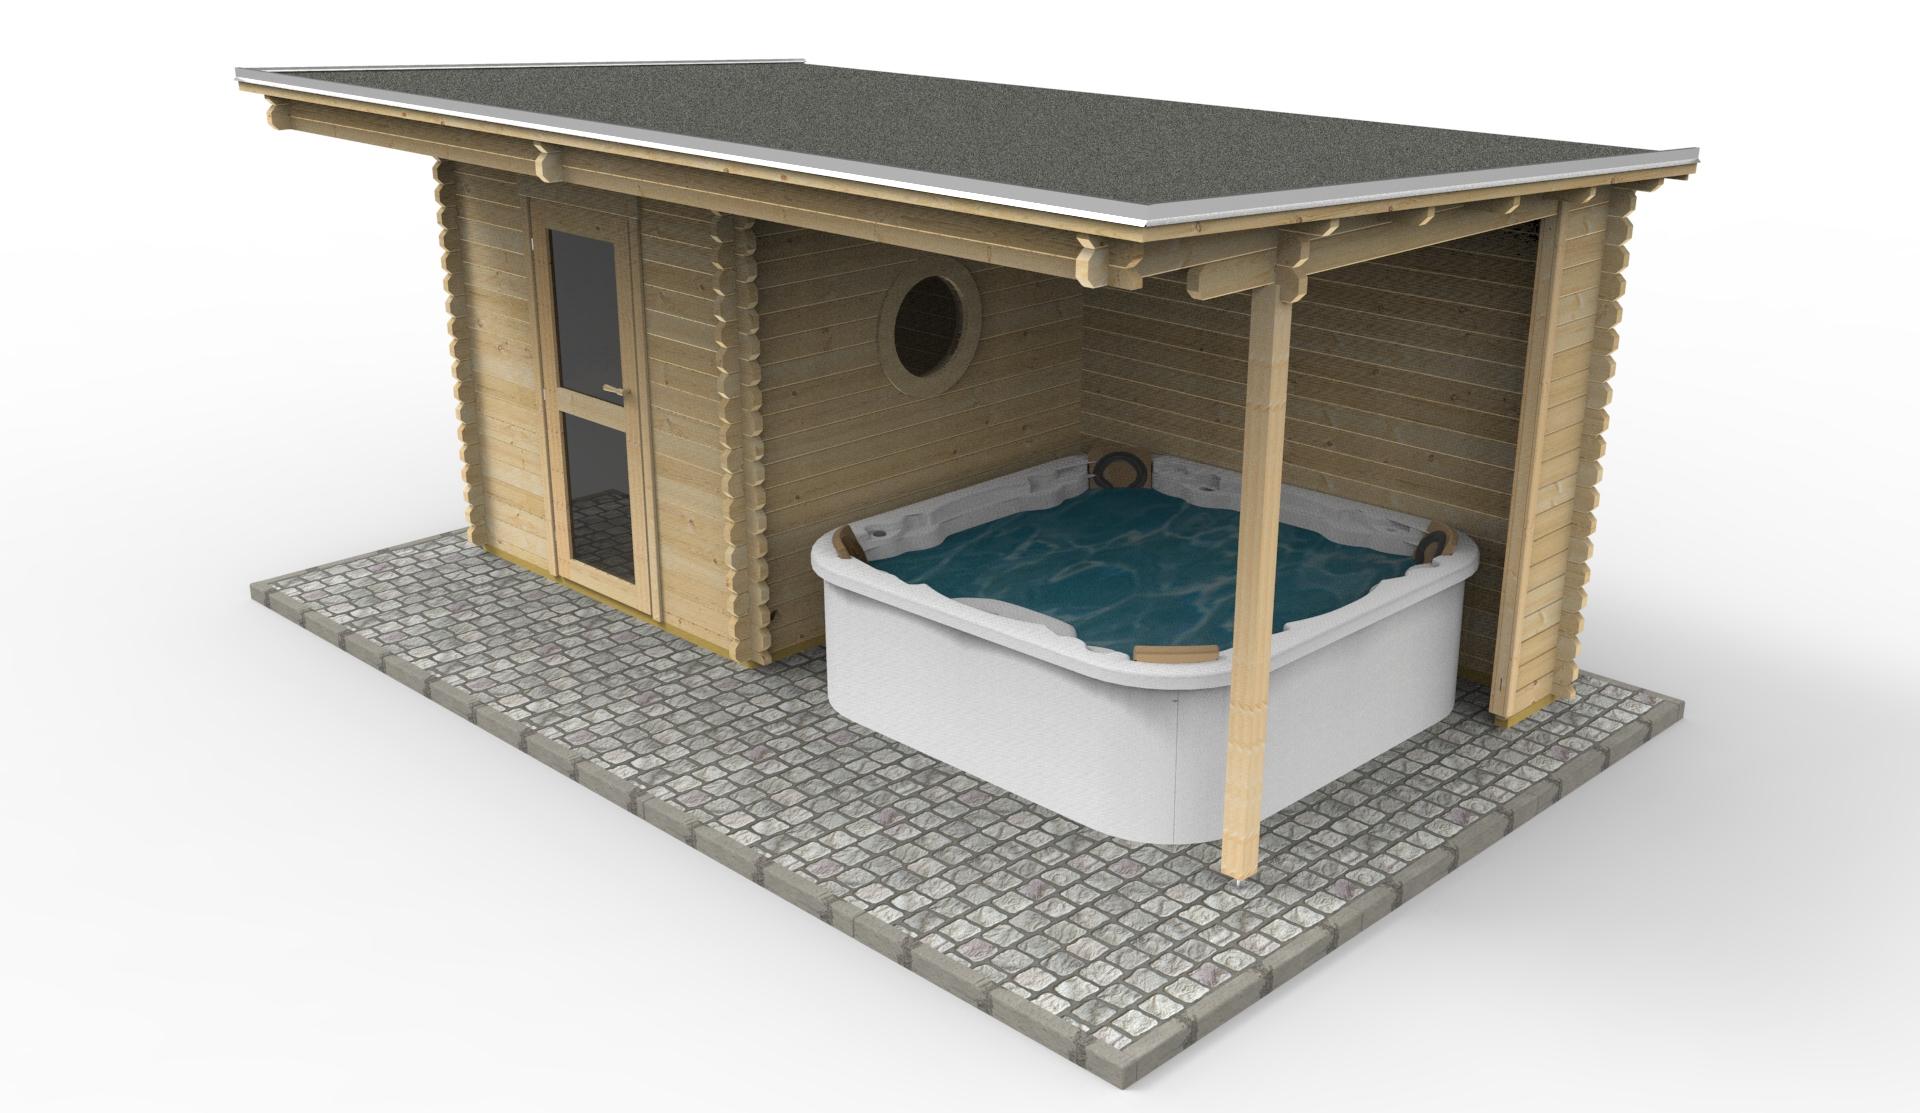 saunahaus blockbohlensauna sauna gartensauna aussensauna. Black Bedroom Furniture Sets. Home Design Ideas